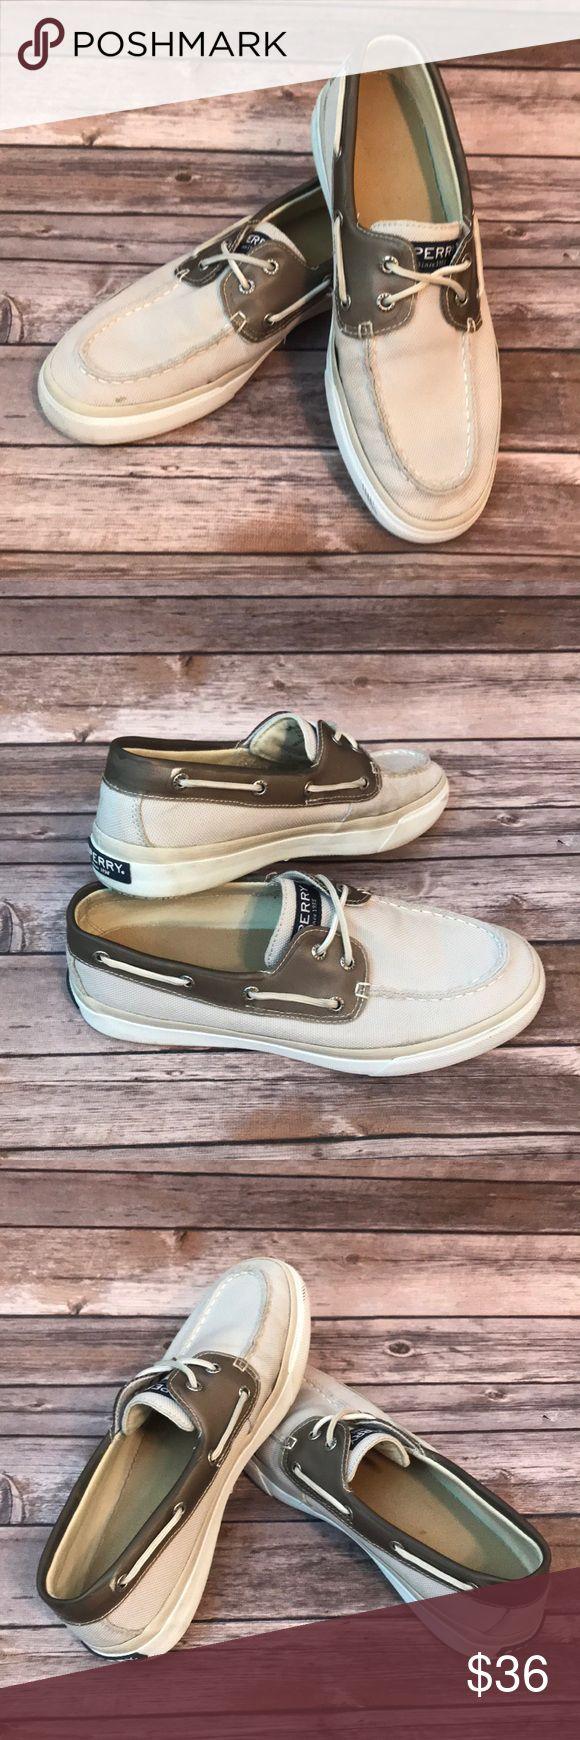 Sperry Men's Canvas Boat Shoes size 9.5 Sperry Men's Canvas Boat Shoes size 9.5 Sperry Shoes Boat Shoes